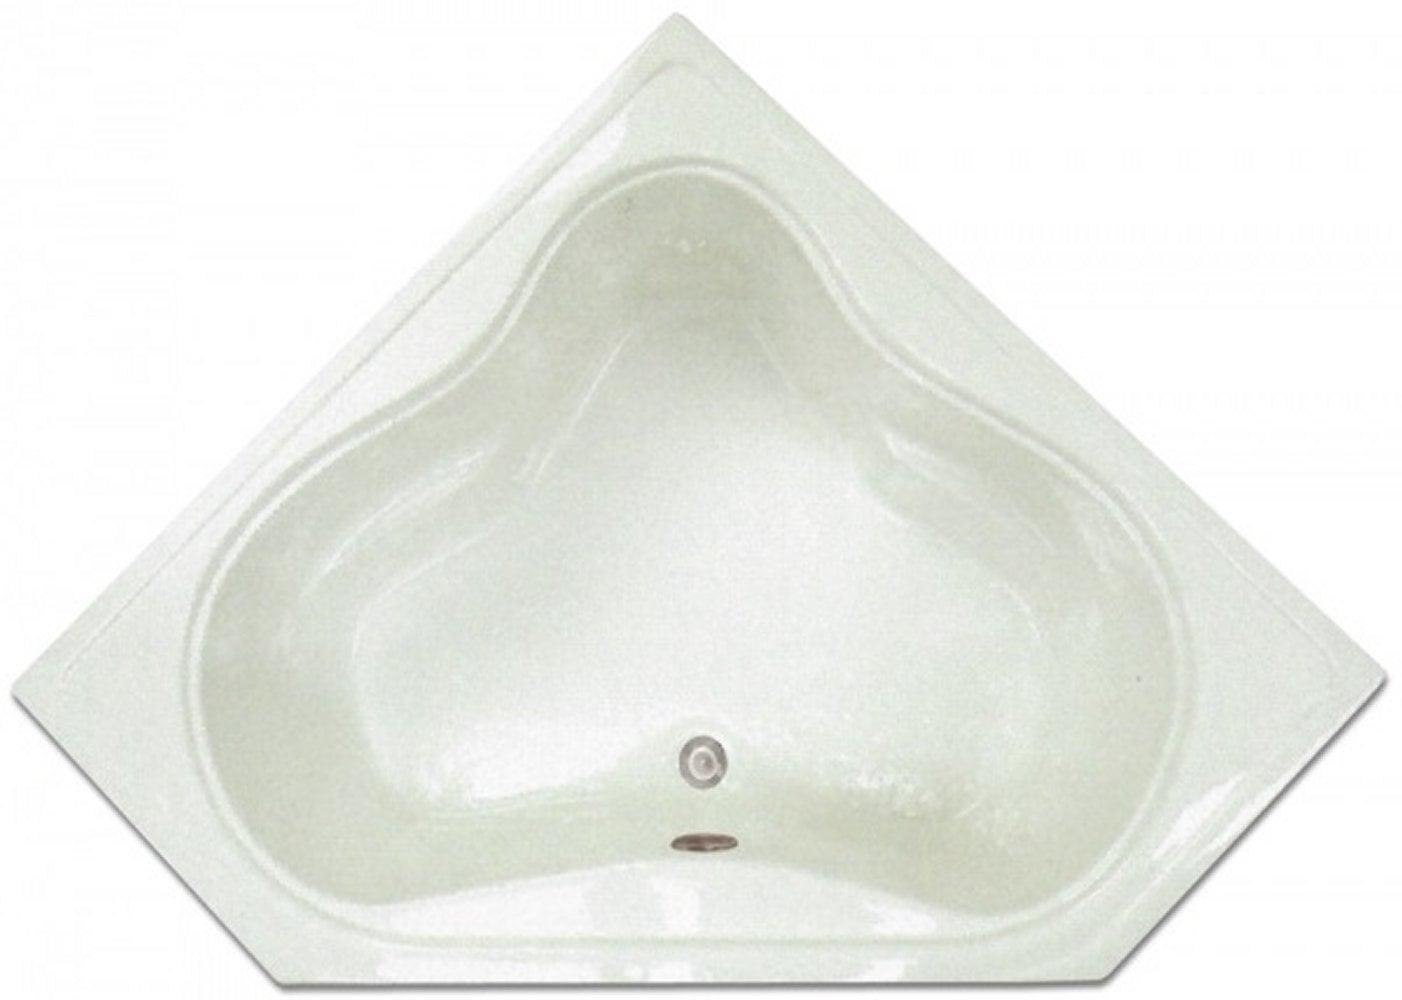 Drop-in Bathtub / 53.75x22.75x17.5 / high gloss white acrylic / Corner / LPI303-S Pinnacle Bath - Soaker 0